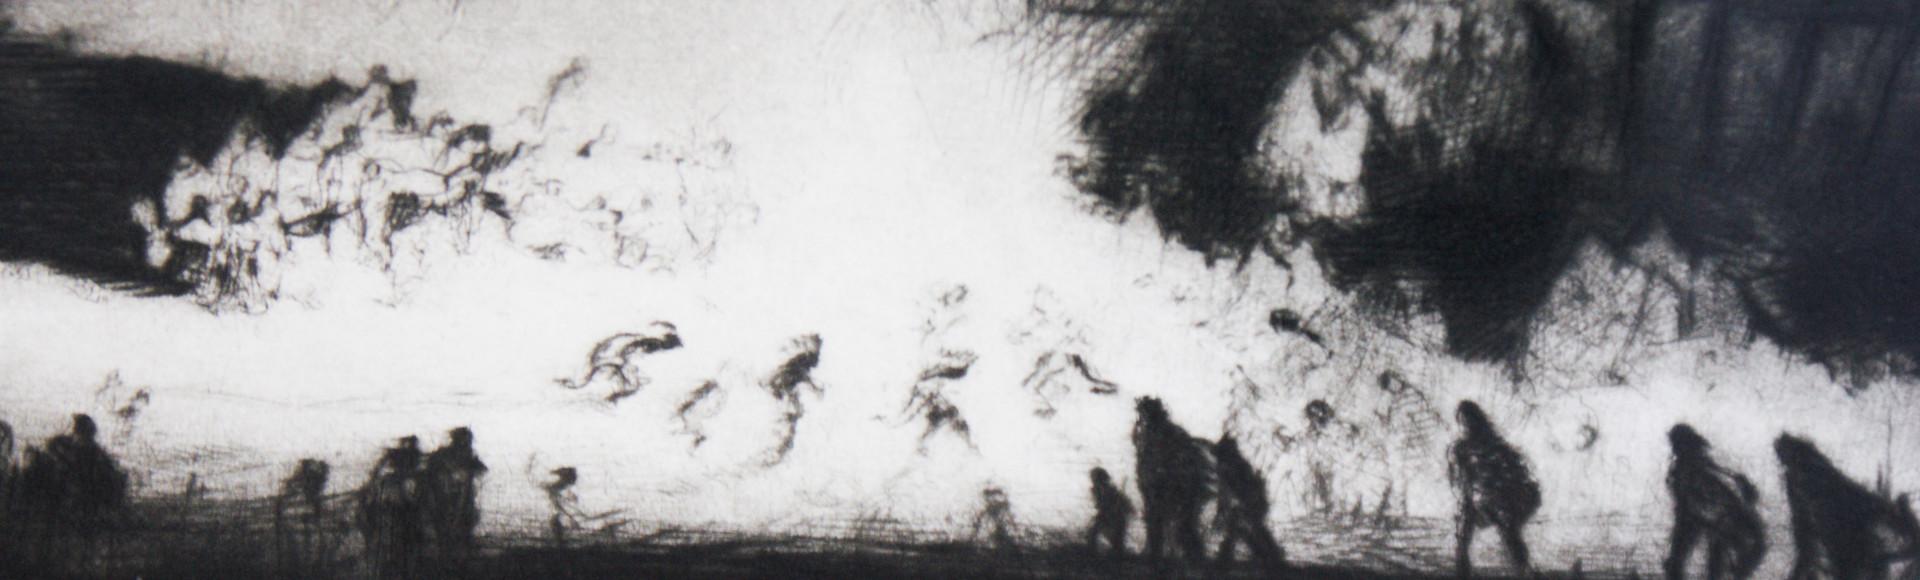 """Pueblo Firelight Dance"" Gene Kloss (1903-1996)"